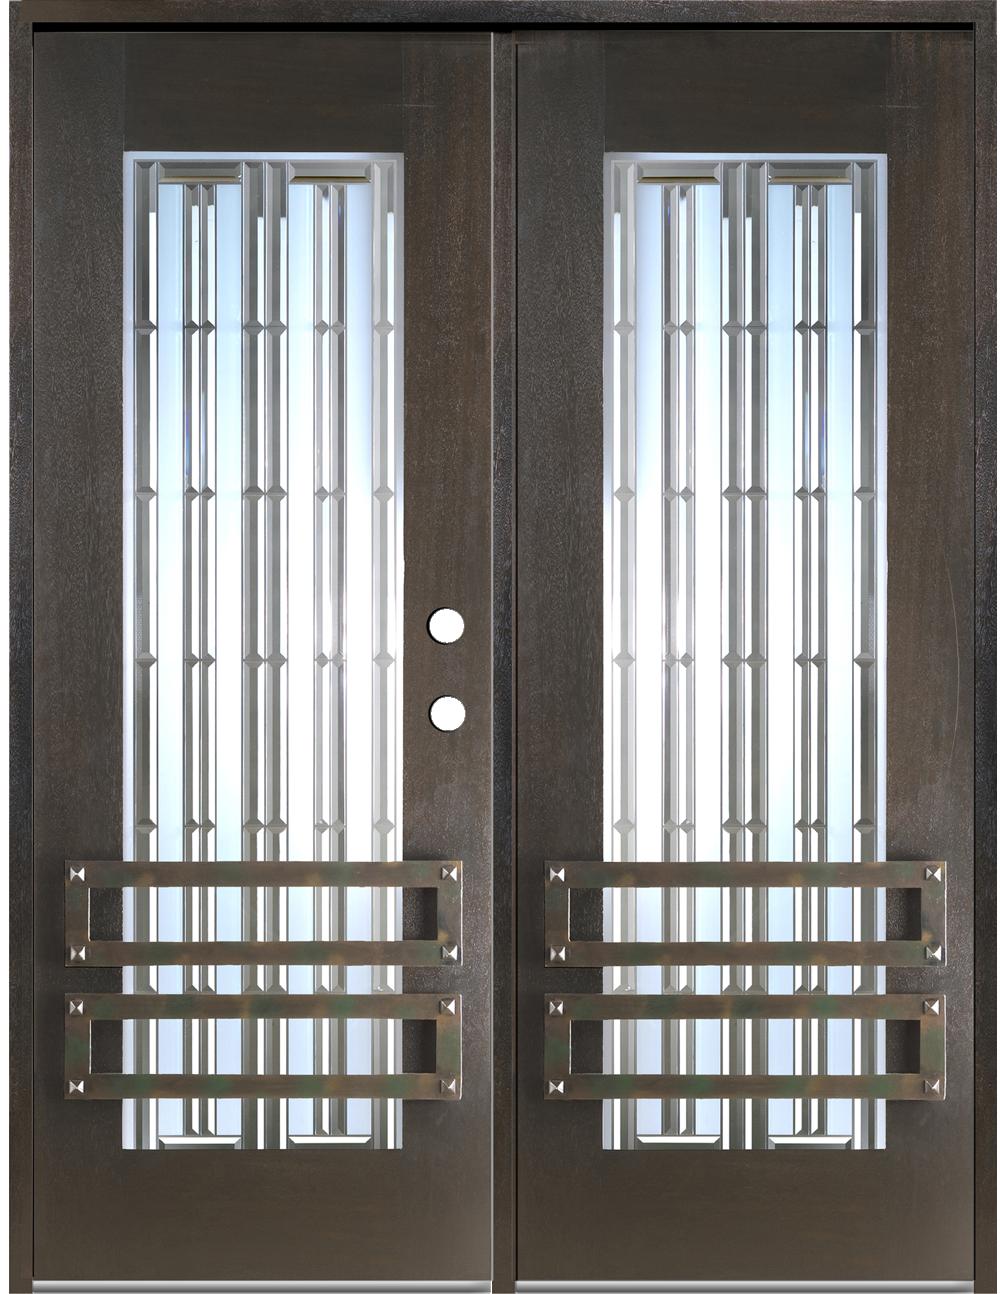 Door & Pin by Vinicius Ribeiro on Humanização Photoshop | Pinterest | Photoshop